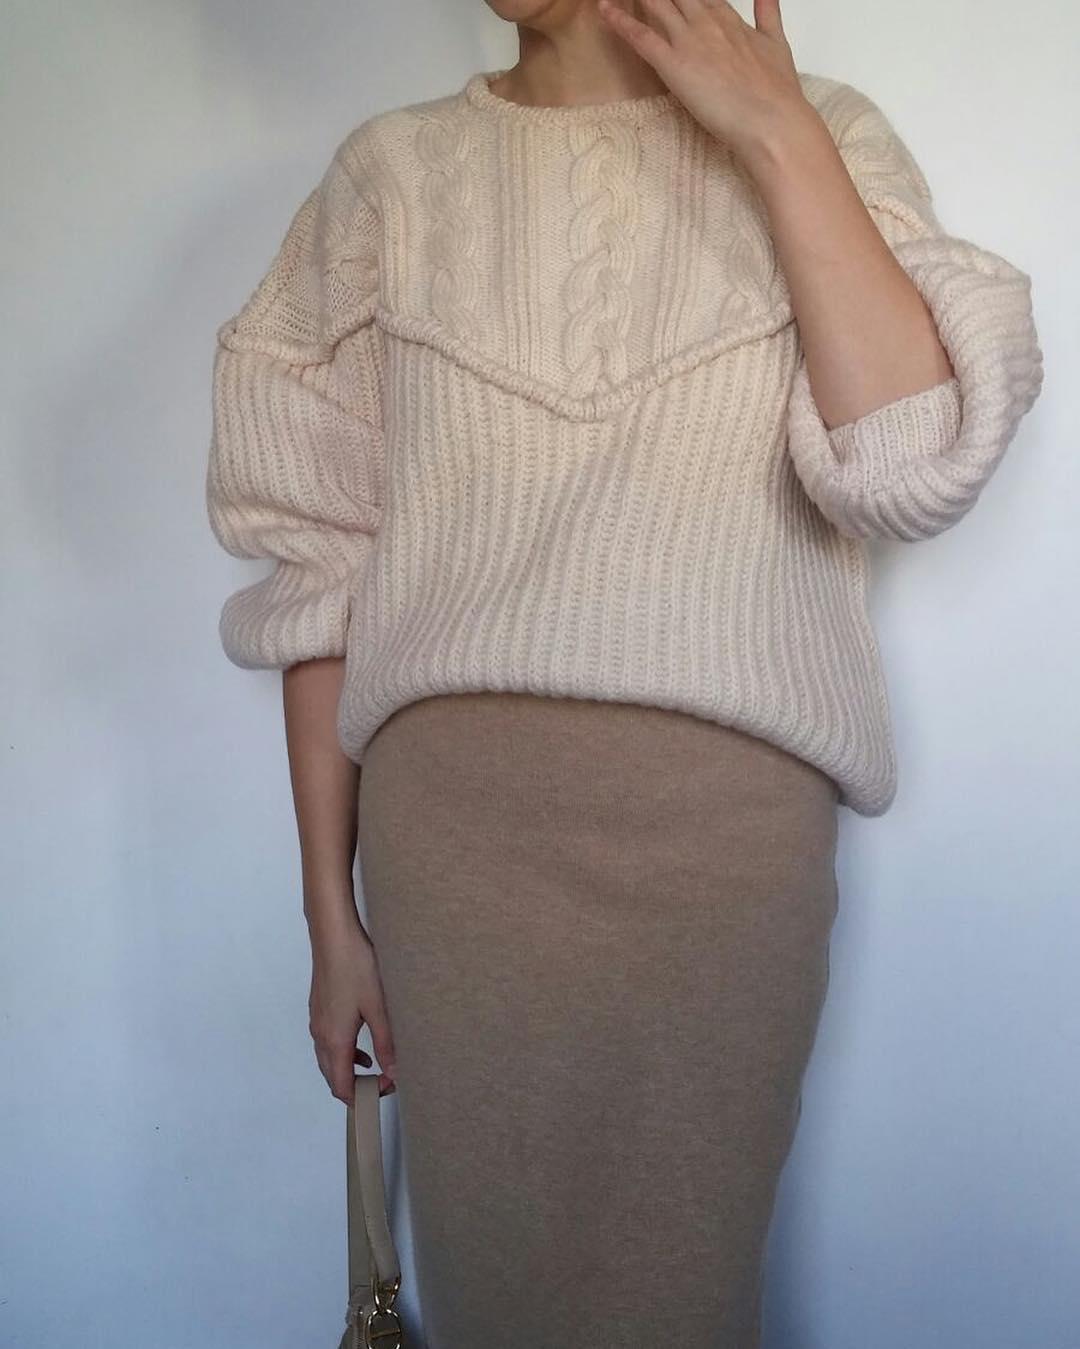 Beige serenity beige knit culturavintage maxmaraskirt handmadesweater iloveknit beinspired neutraloutfithellip